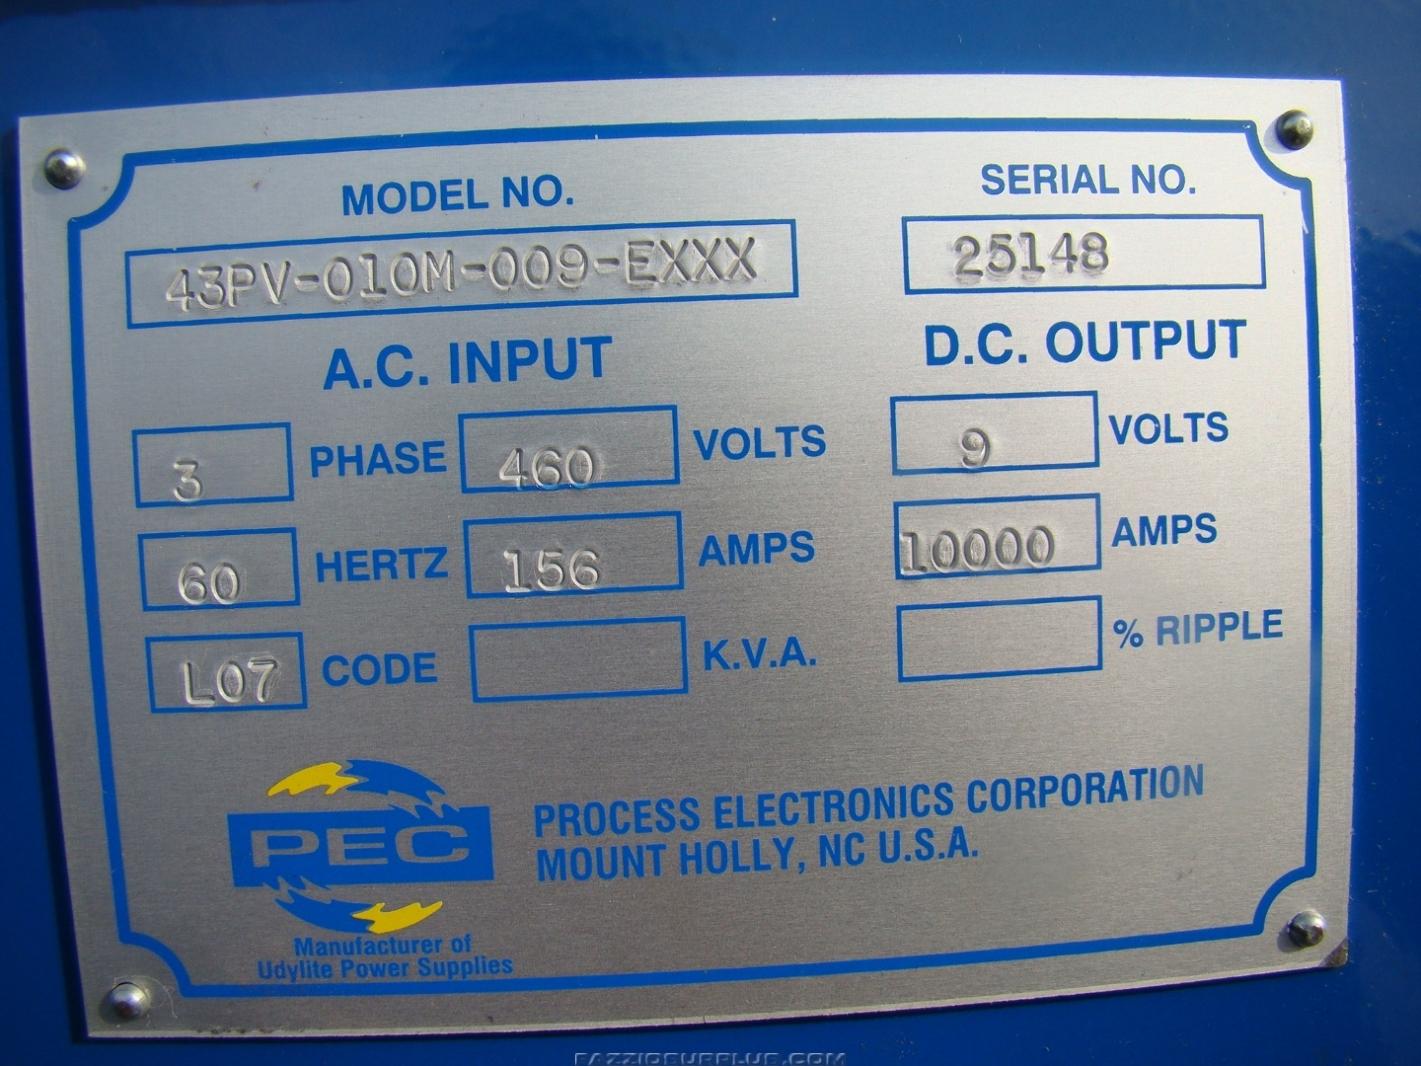 PEC, SASSC 10,000AMP 9V DC Rectifier, 00FL-010M-009-EXXX   Joseph ...